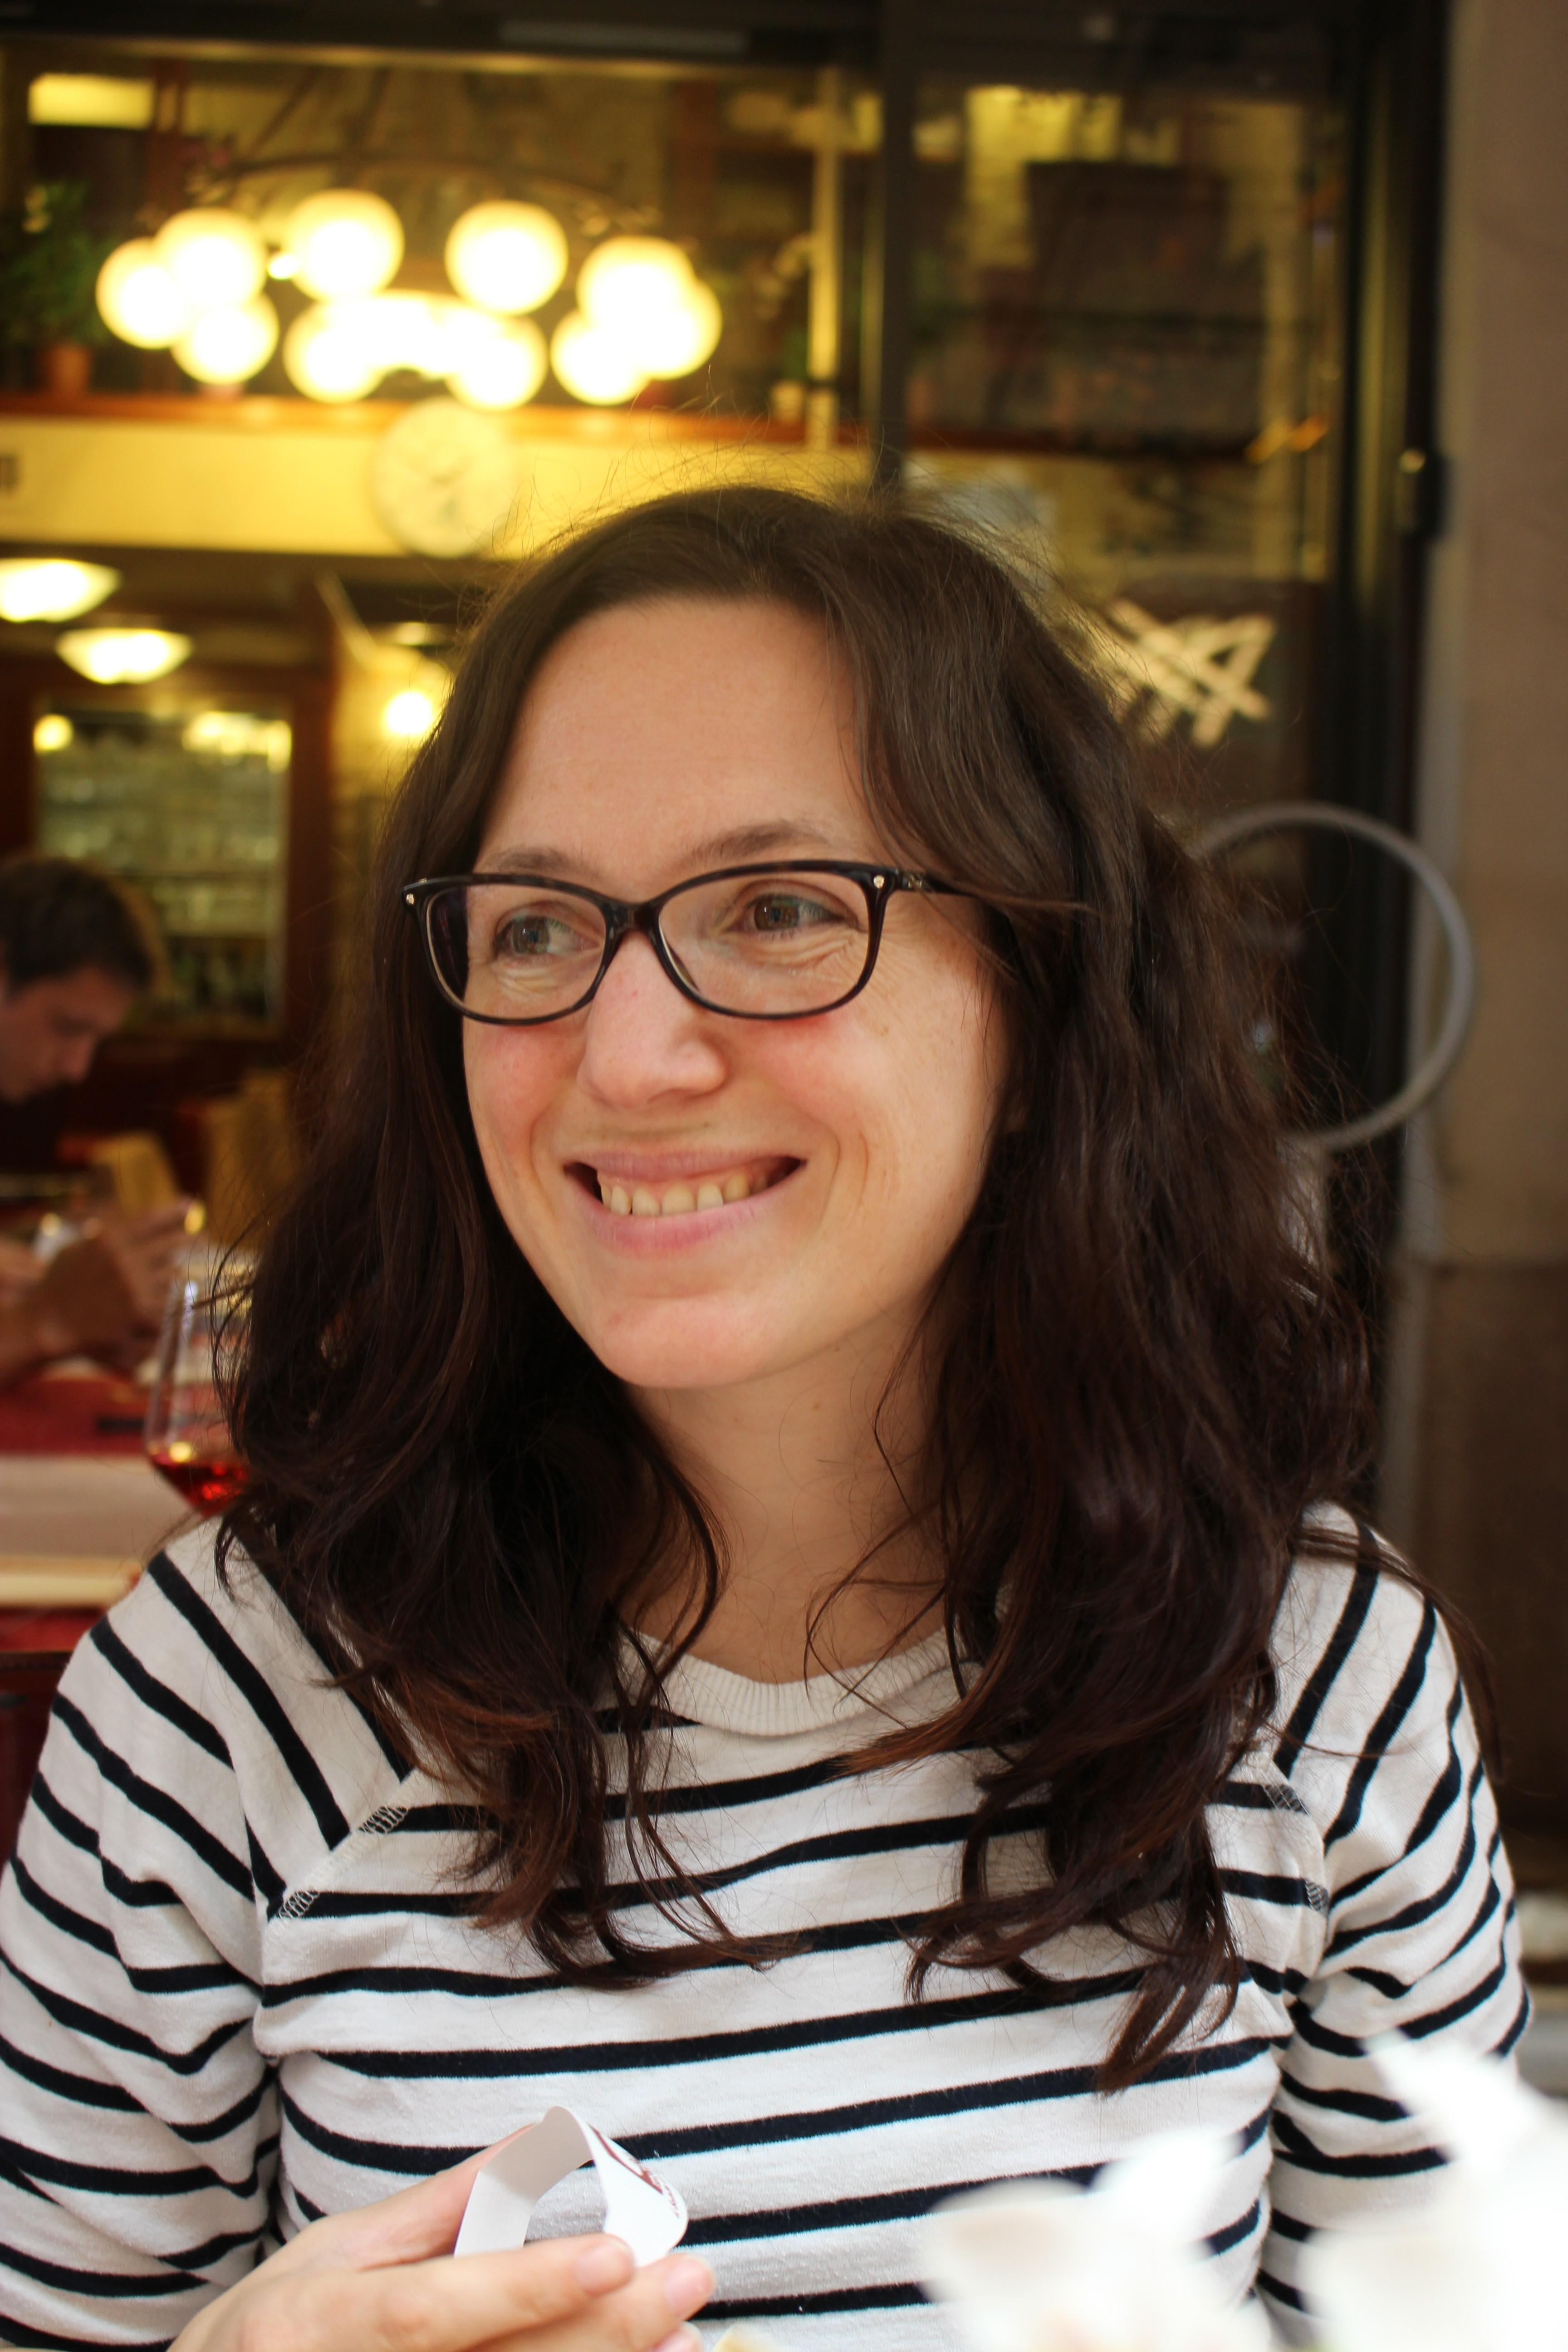 Amandine Charrière